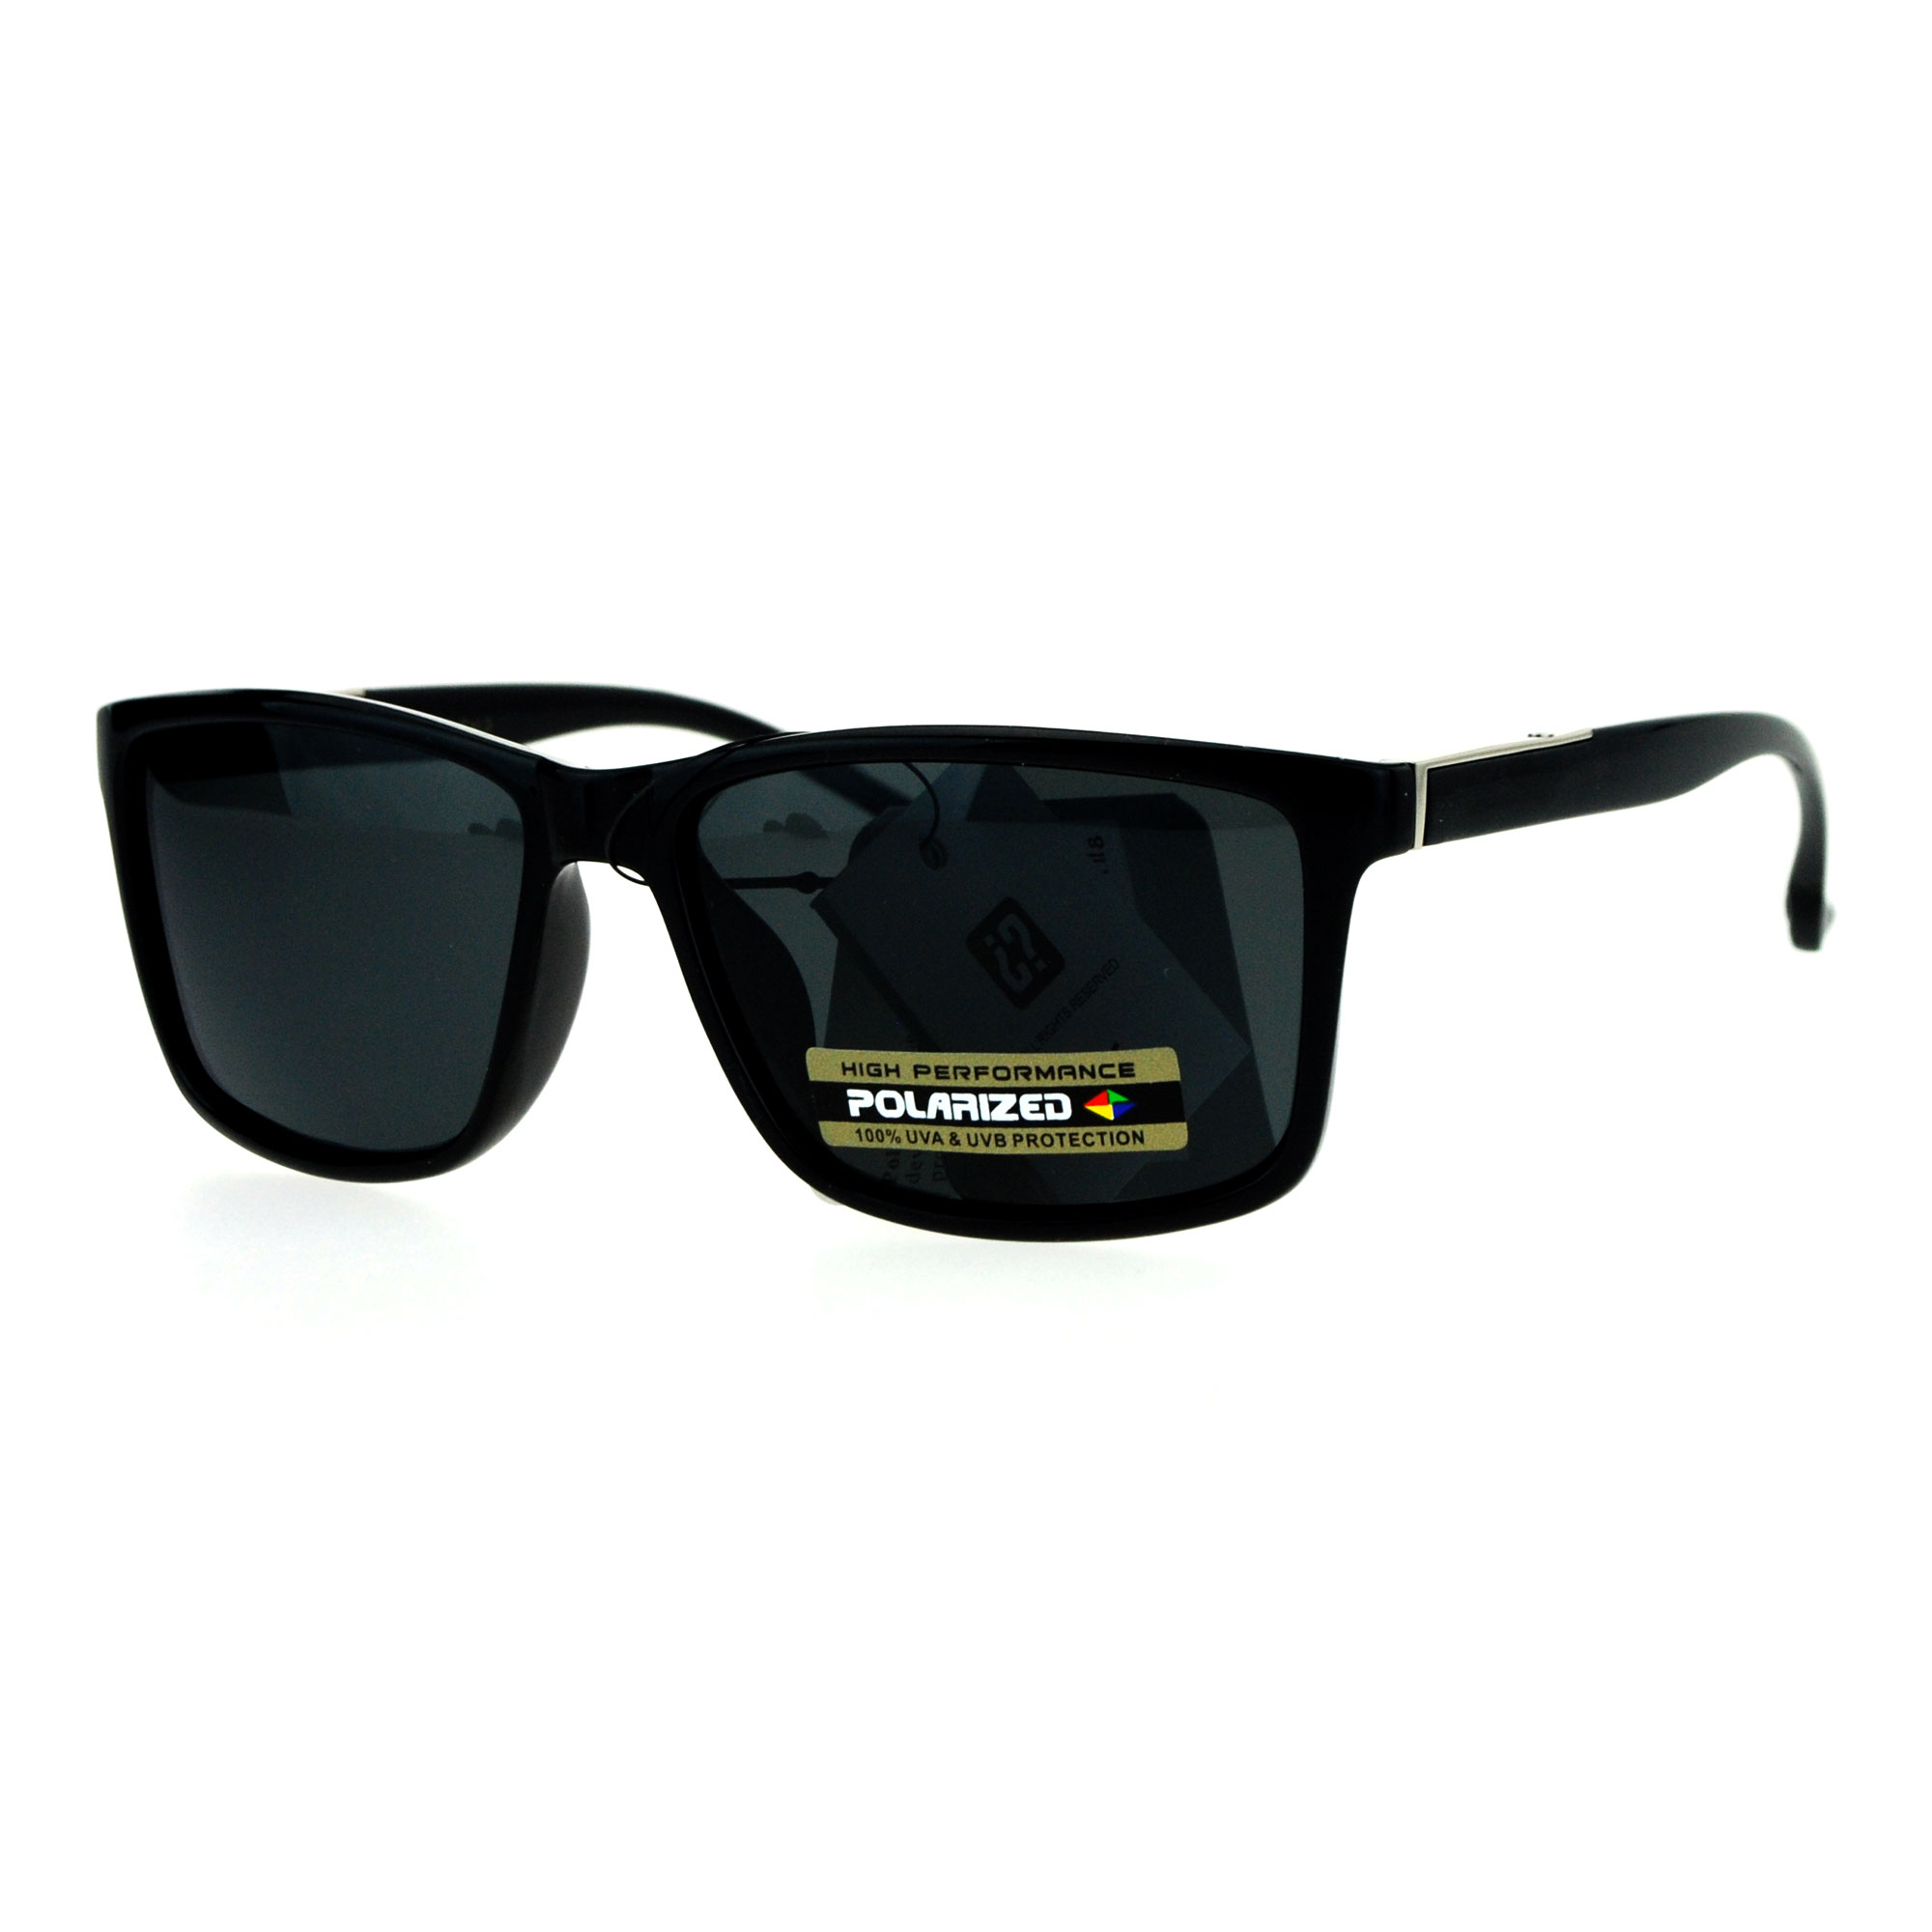 f81825ae2ed3 Polarized Sunglasses Reduce Glare